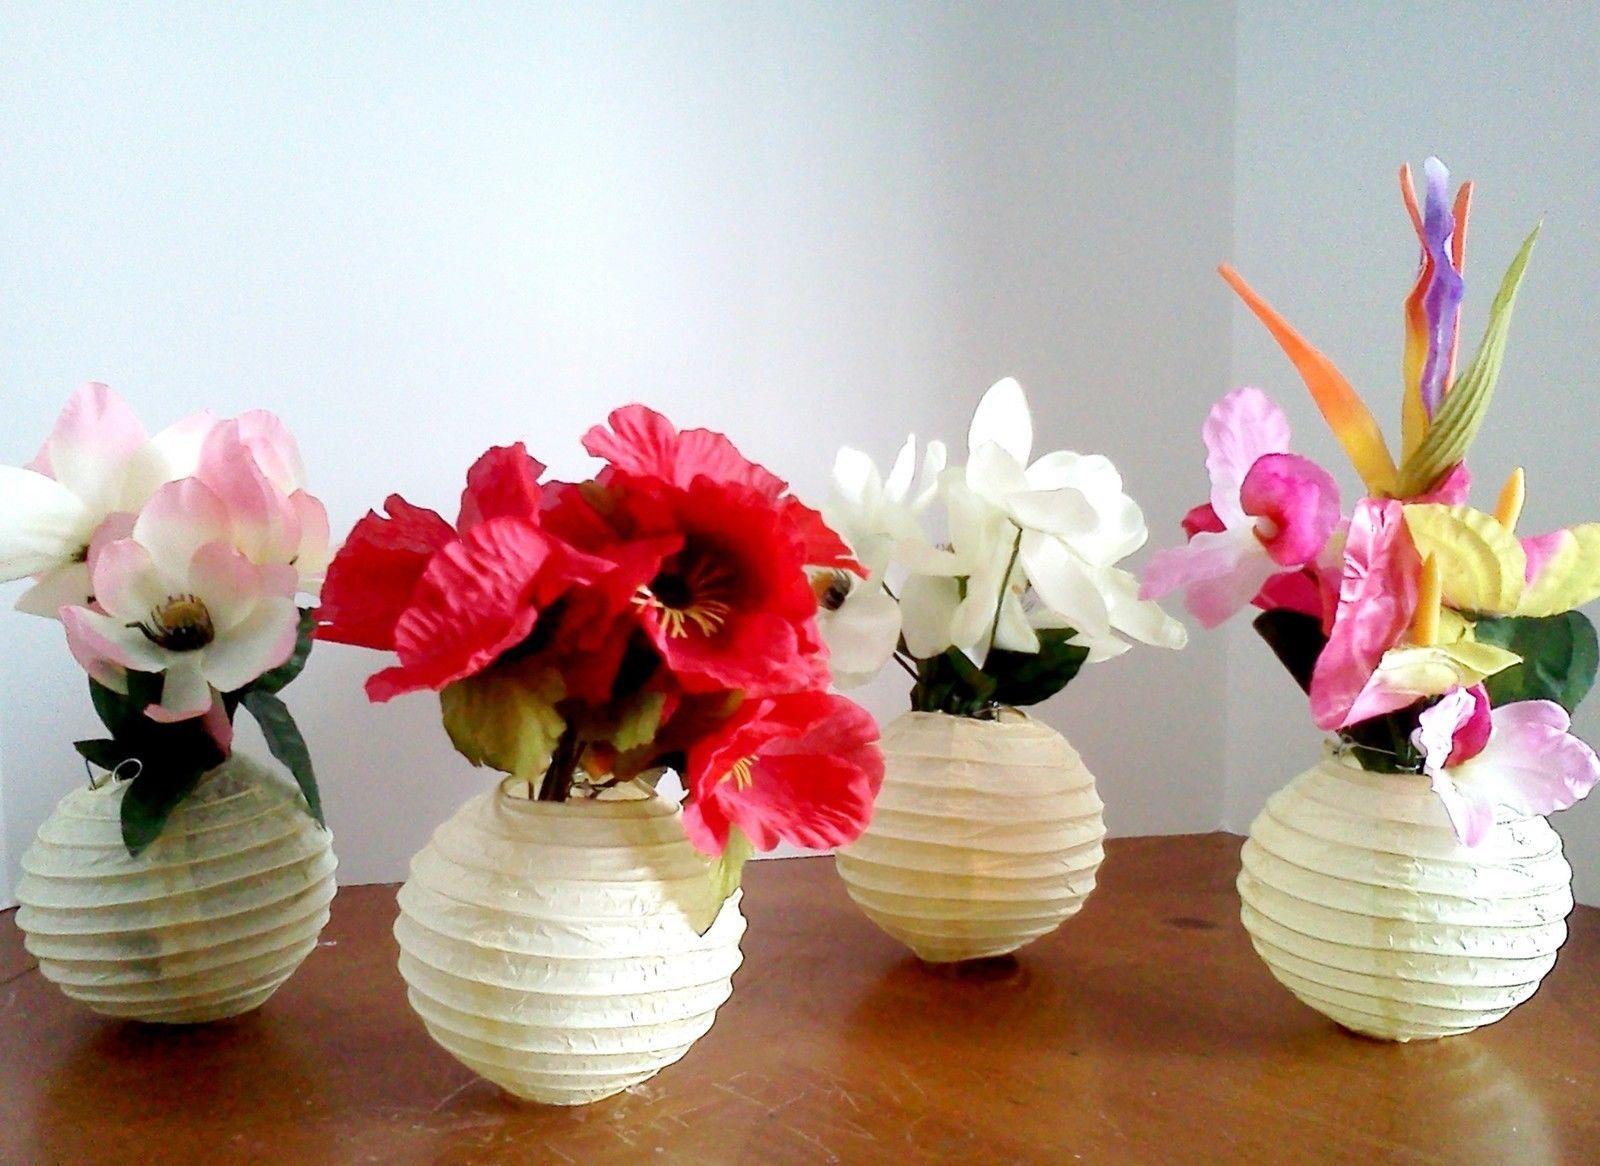 12 ivory white paper chinese lanterns centerpieces wedding party 12 ivory white paper chinese lanterns centerpieces wedding party junglespirit Image collections